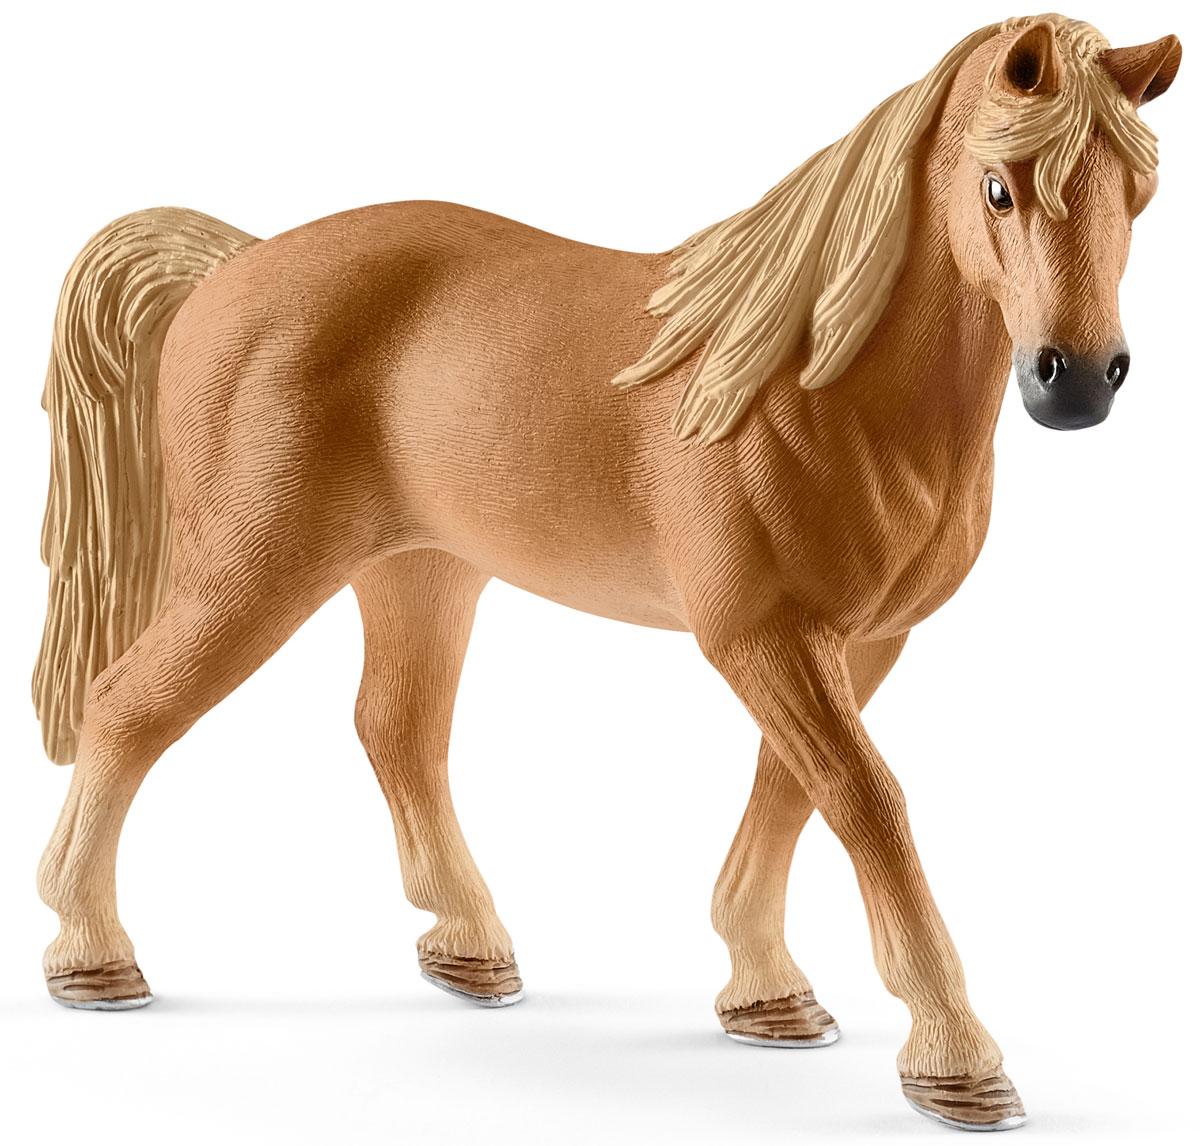 Schleich Фигурка Кобыла Теннесси уокер 13833 schleich фигурка кобыла пинто цвет молочный коричневый